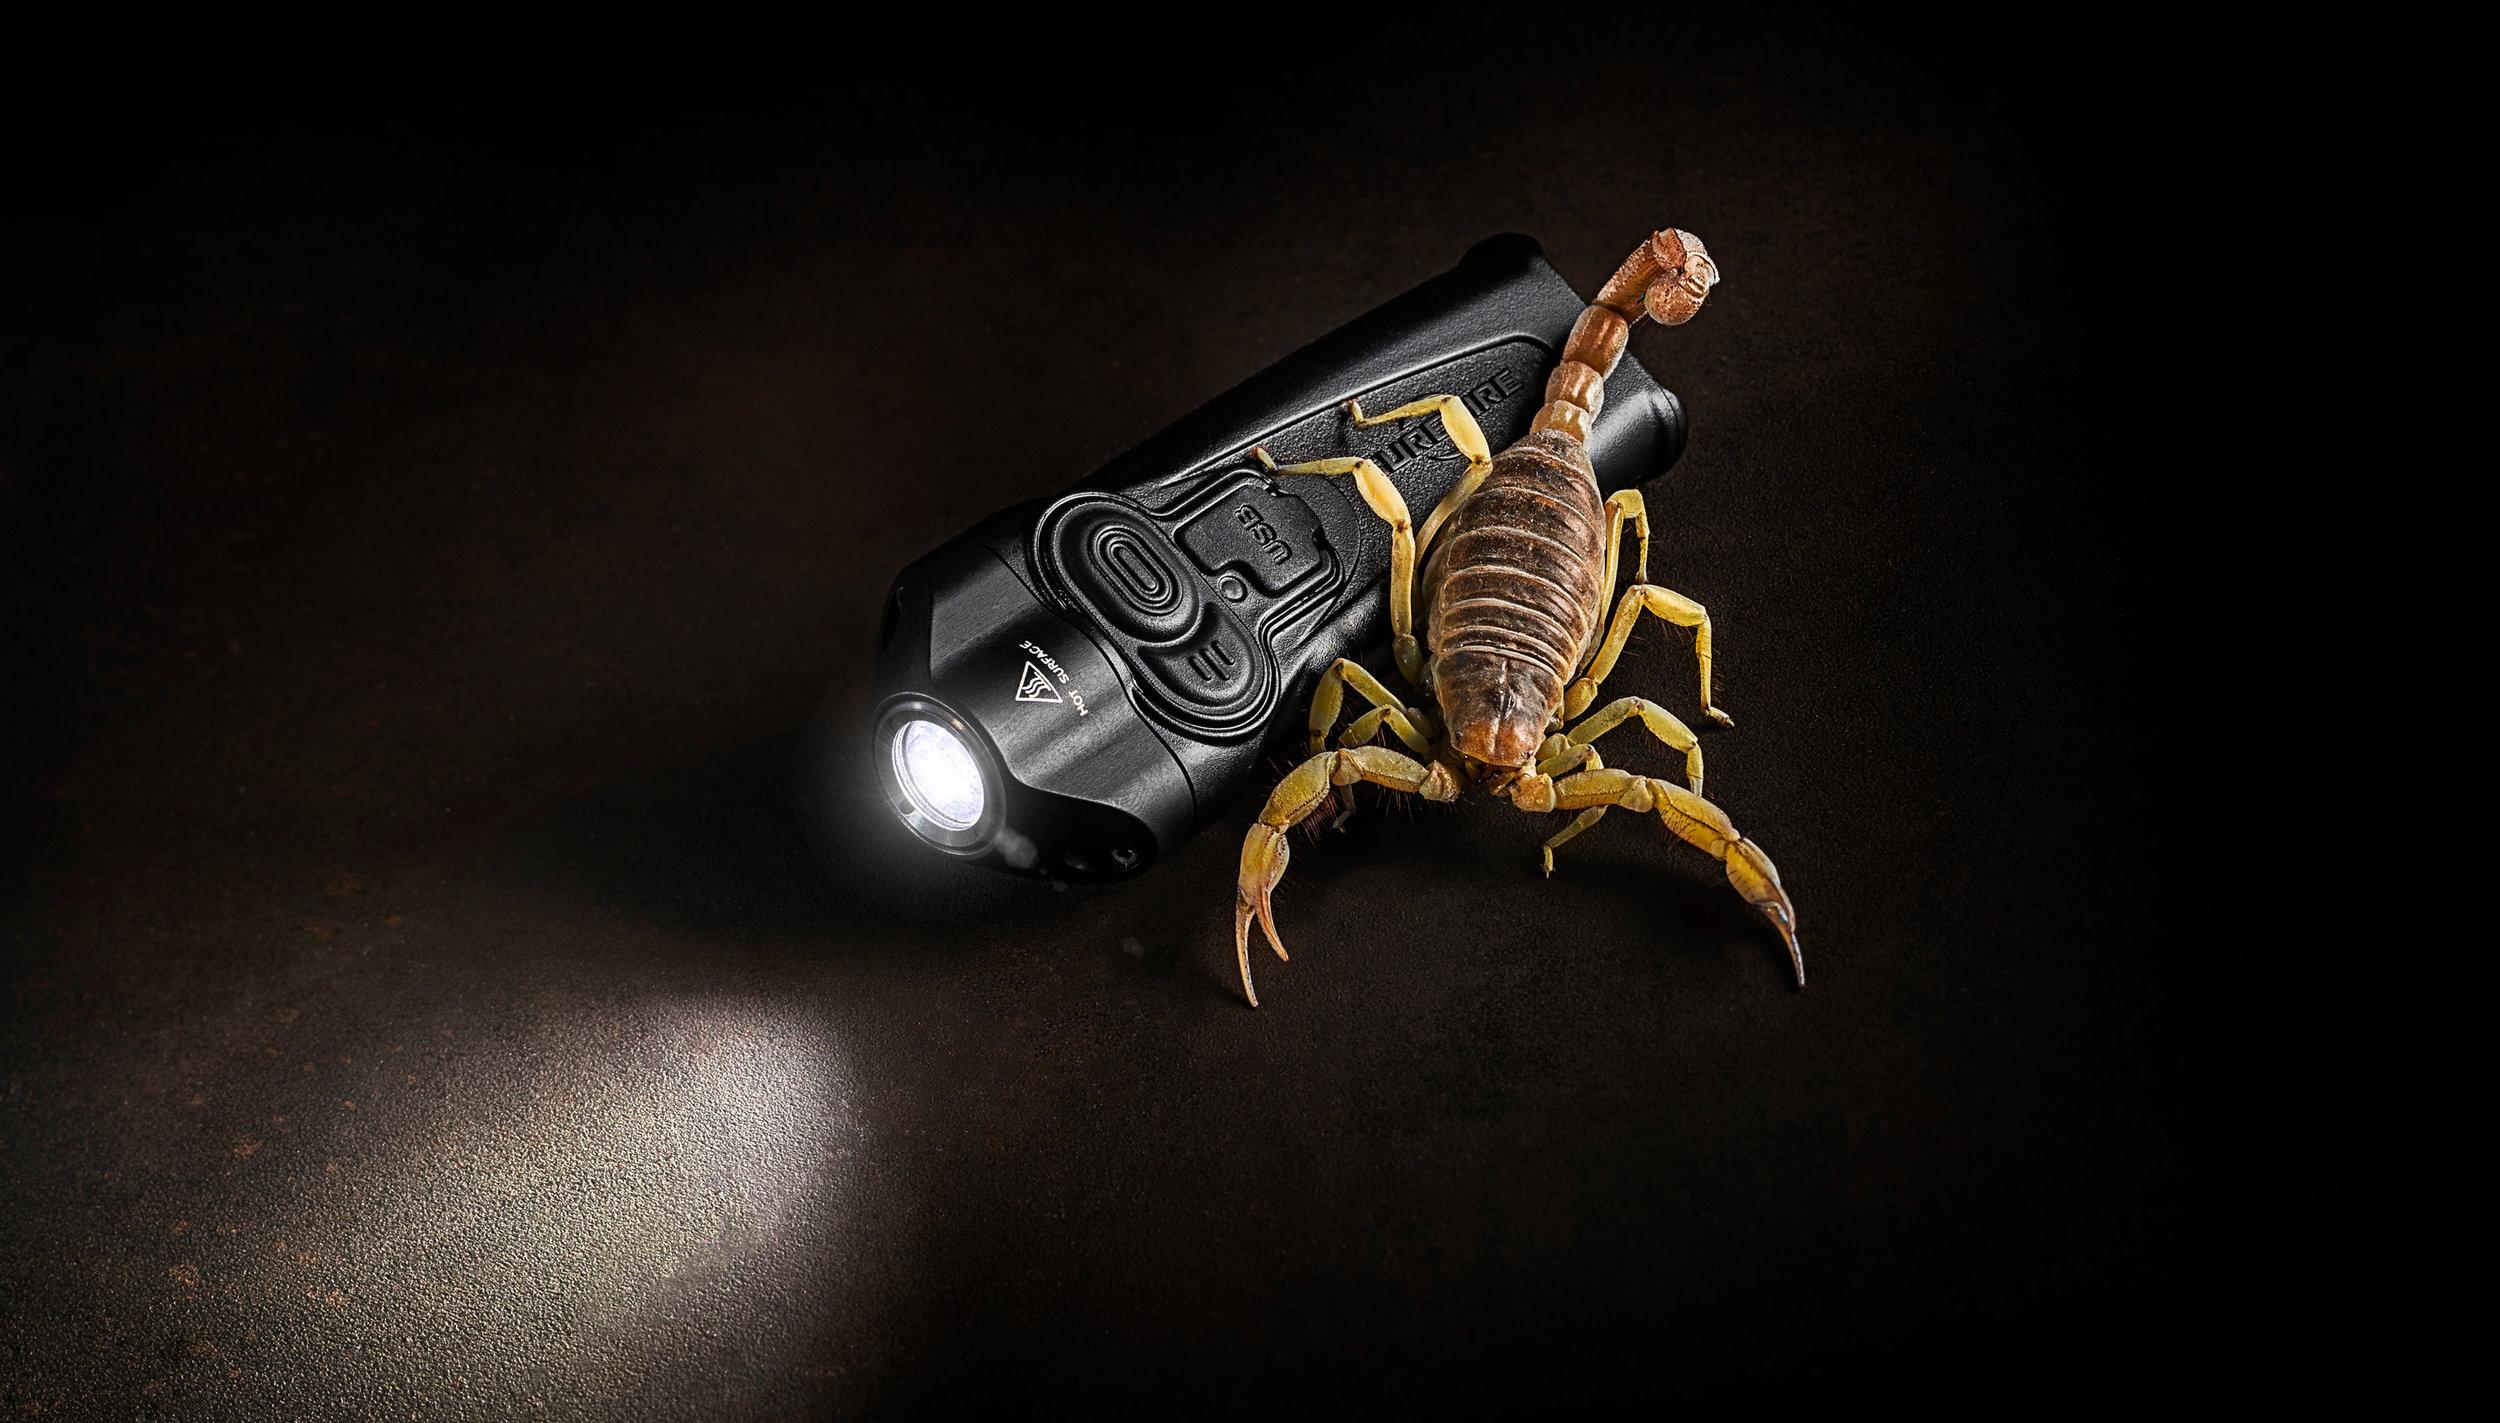 SF-scorpion.jpg